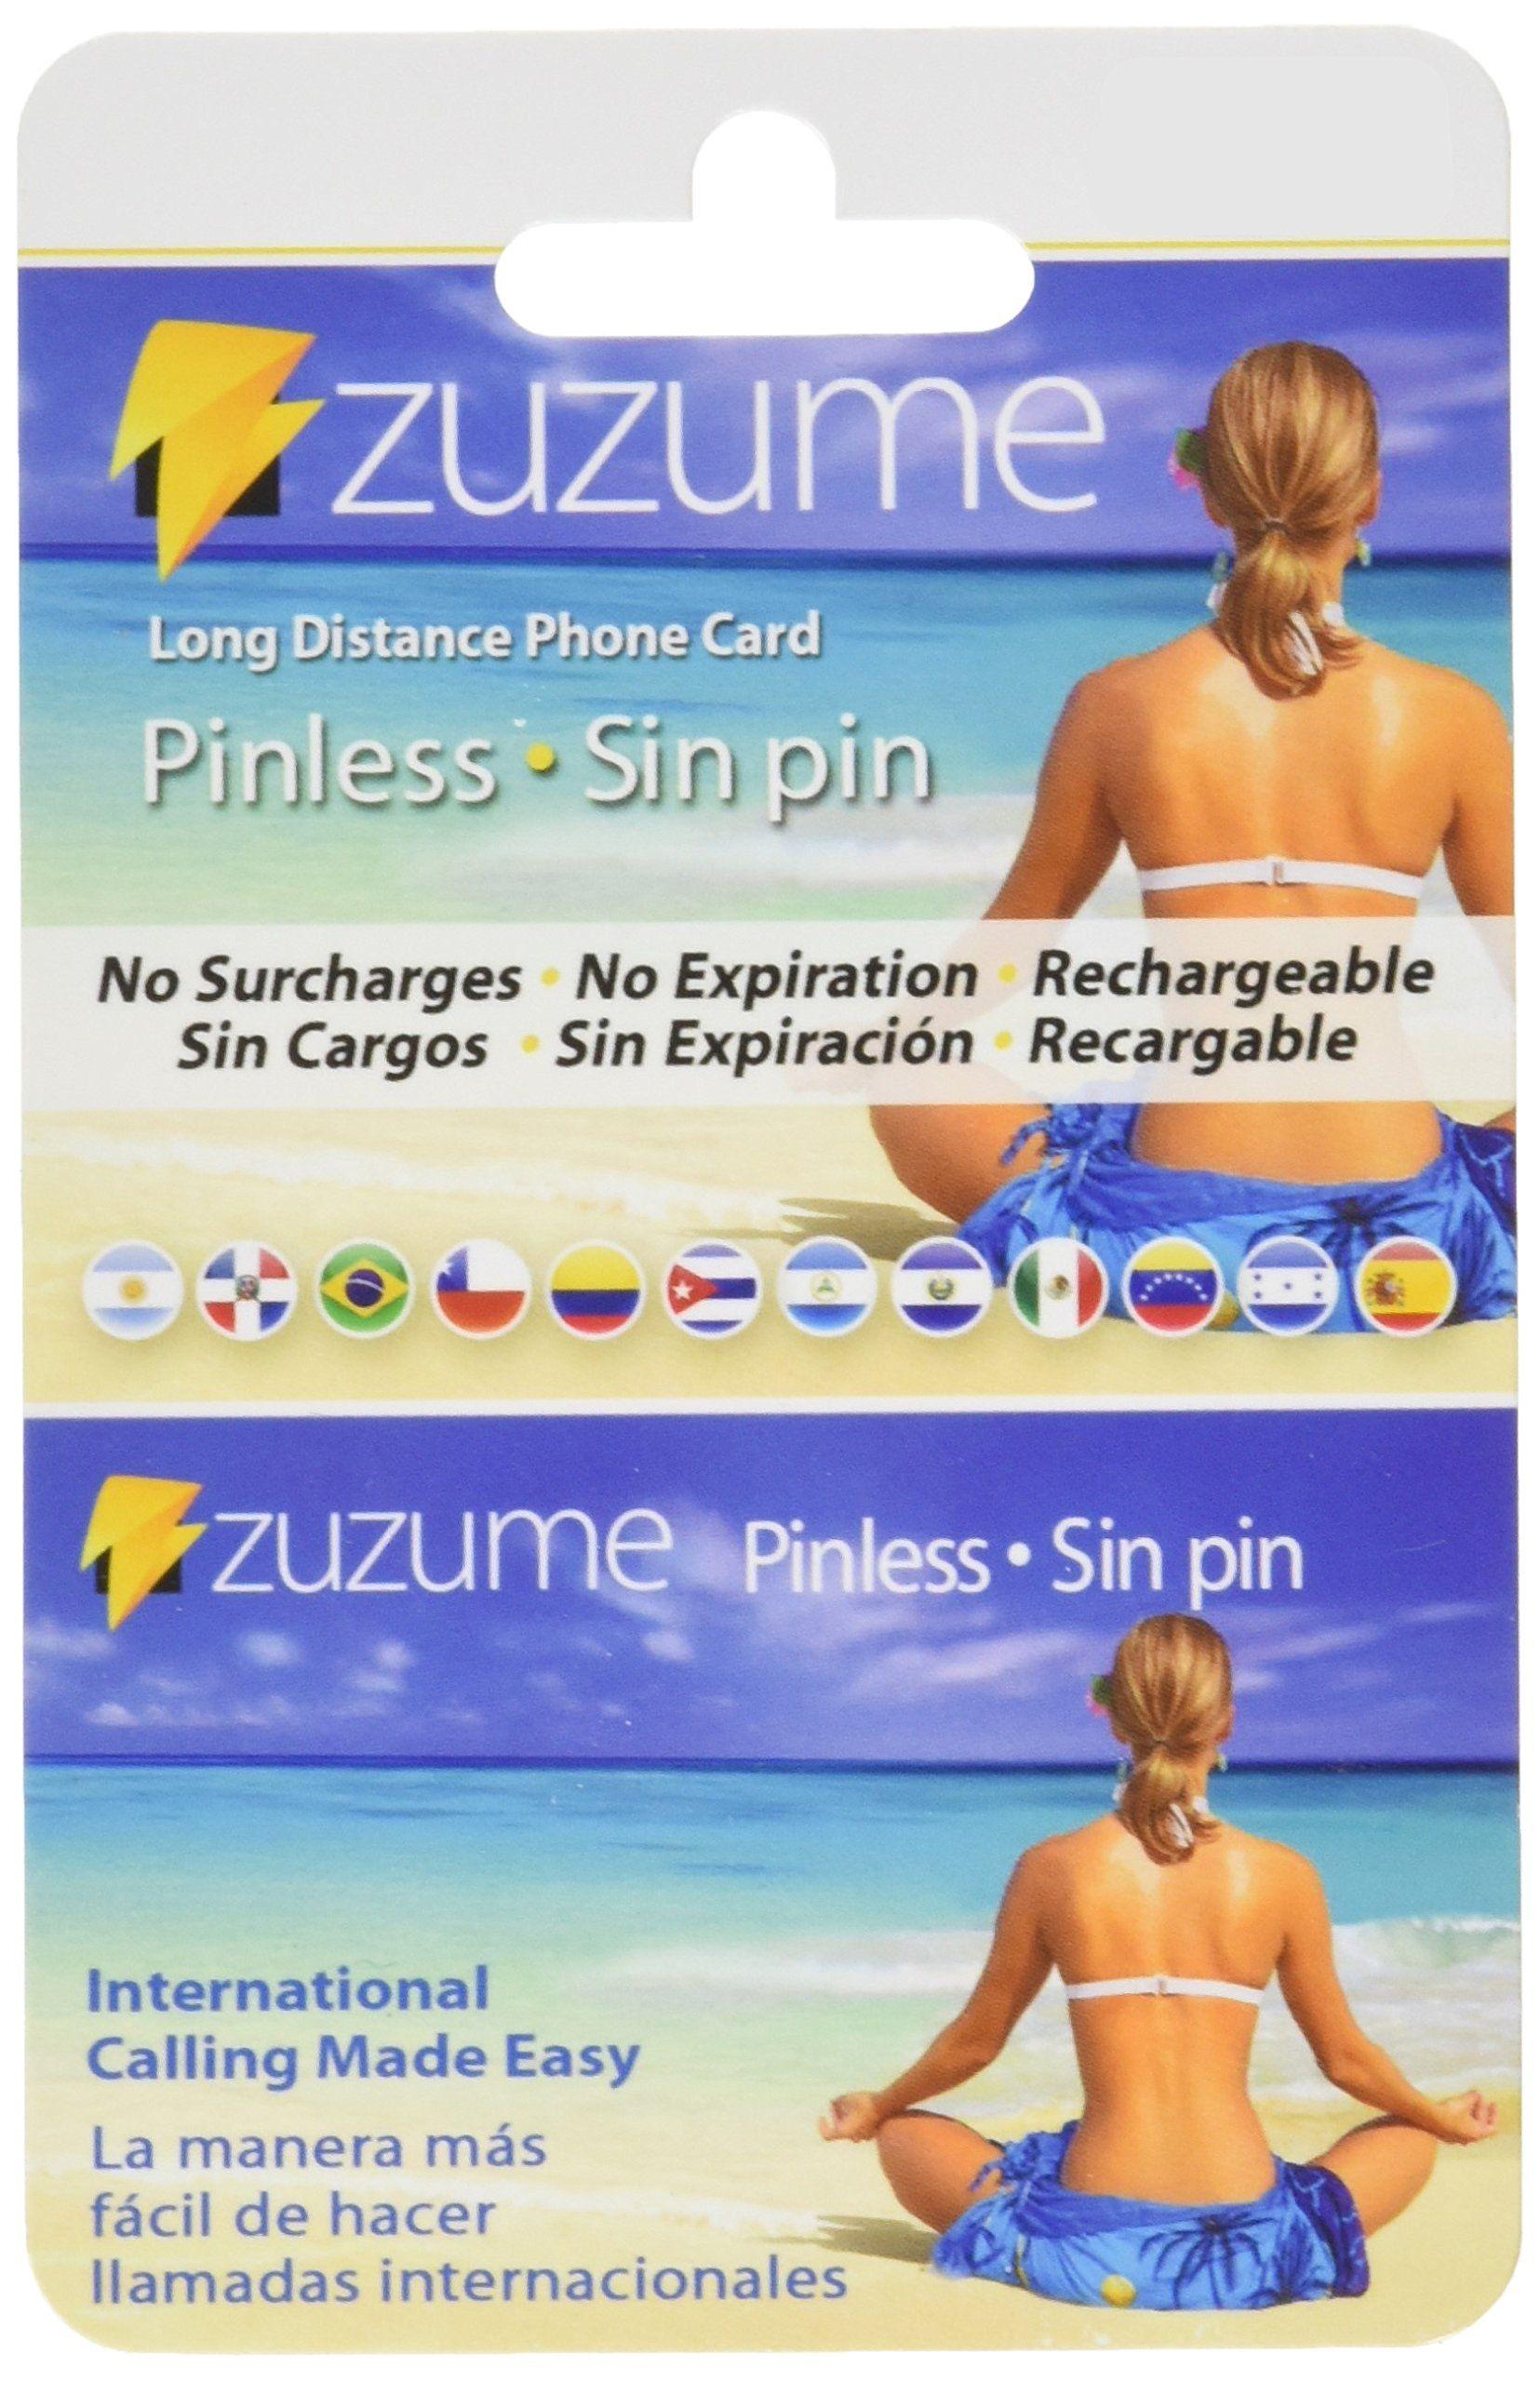 zuzume prepaid phone calling cards for cheap international long distance calls choose 510 - Long Distance Calling Cards